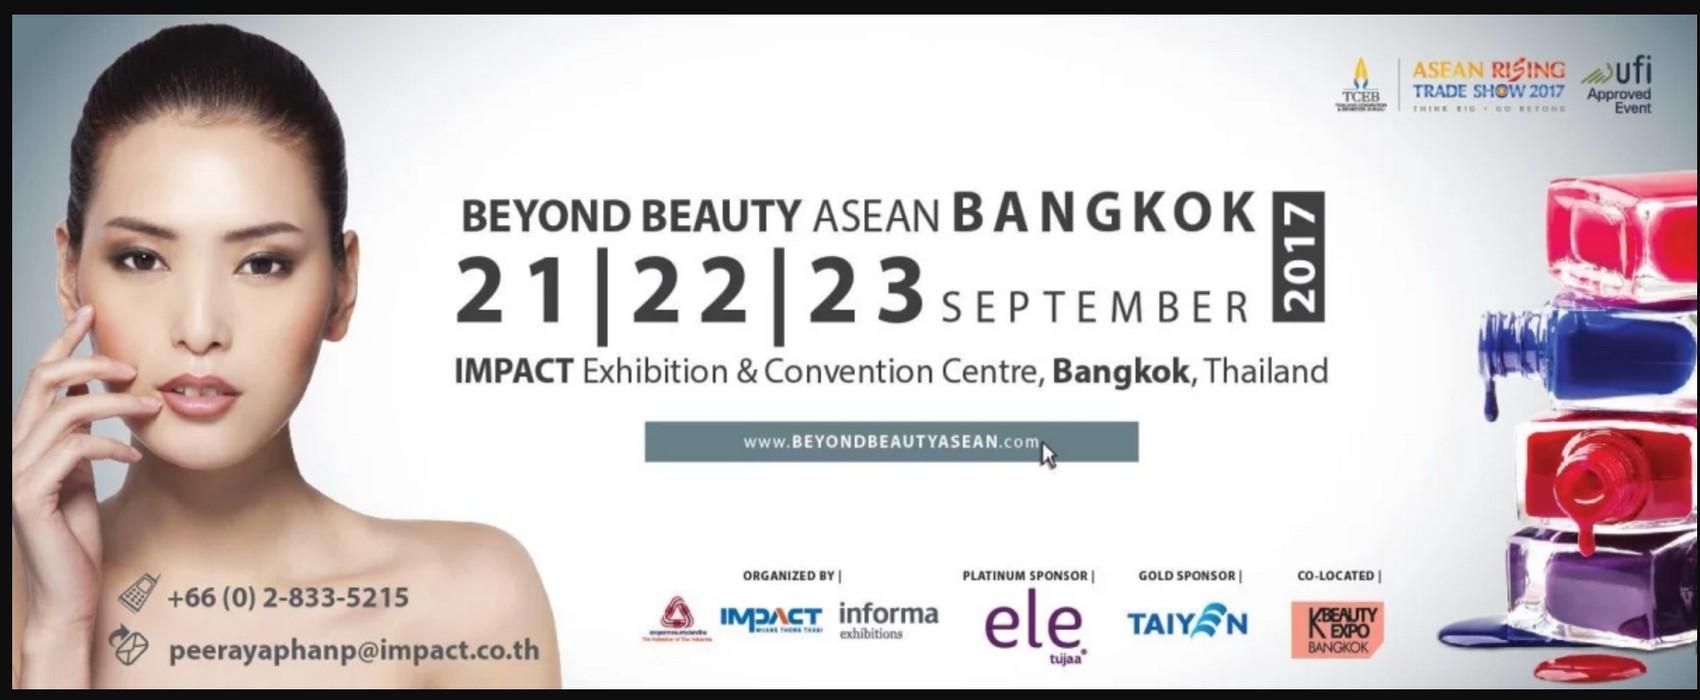 Exhibition of Beyond Beauty ASEAN in Bangkok